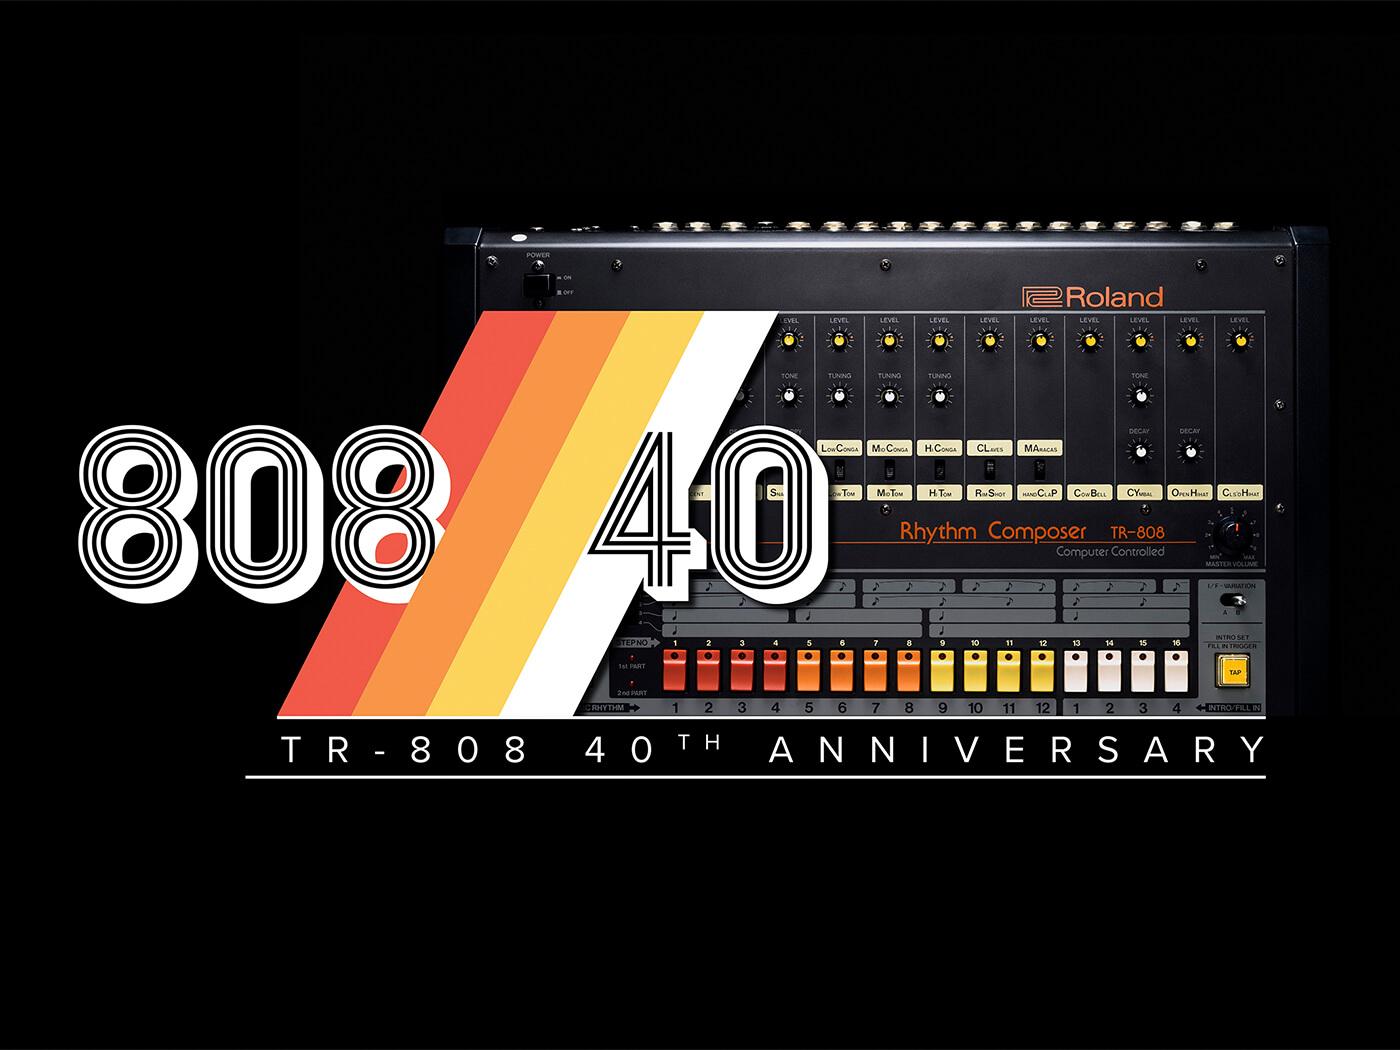 Yocto TR-808 clone